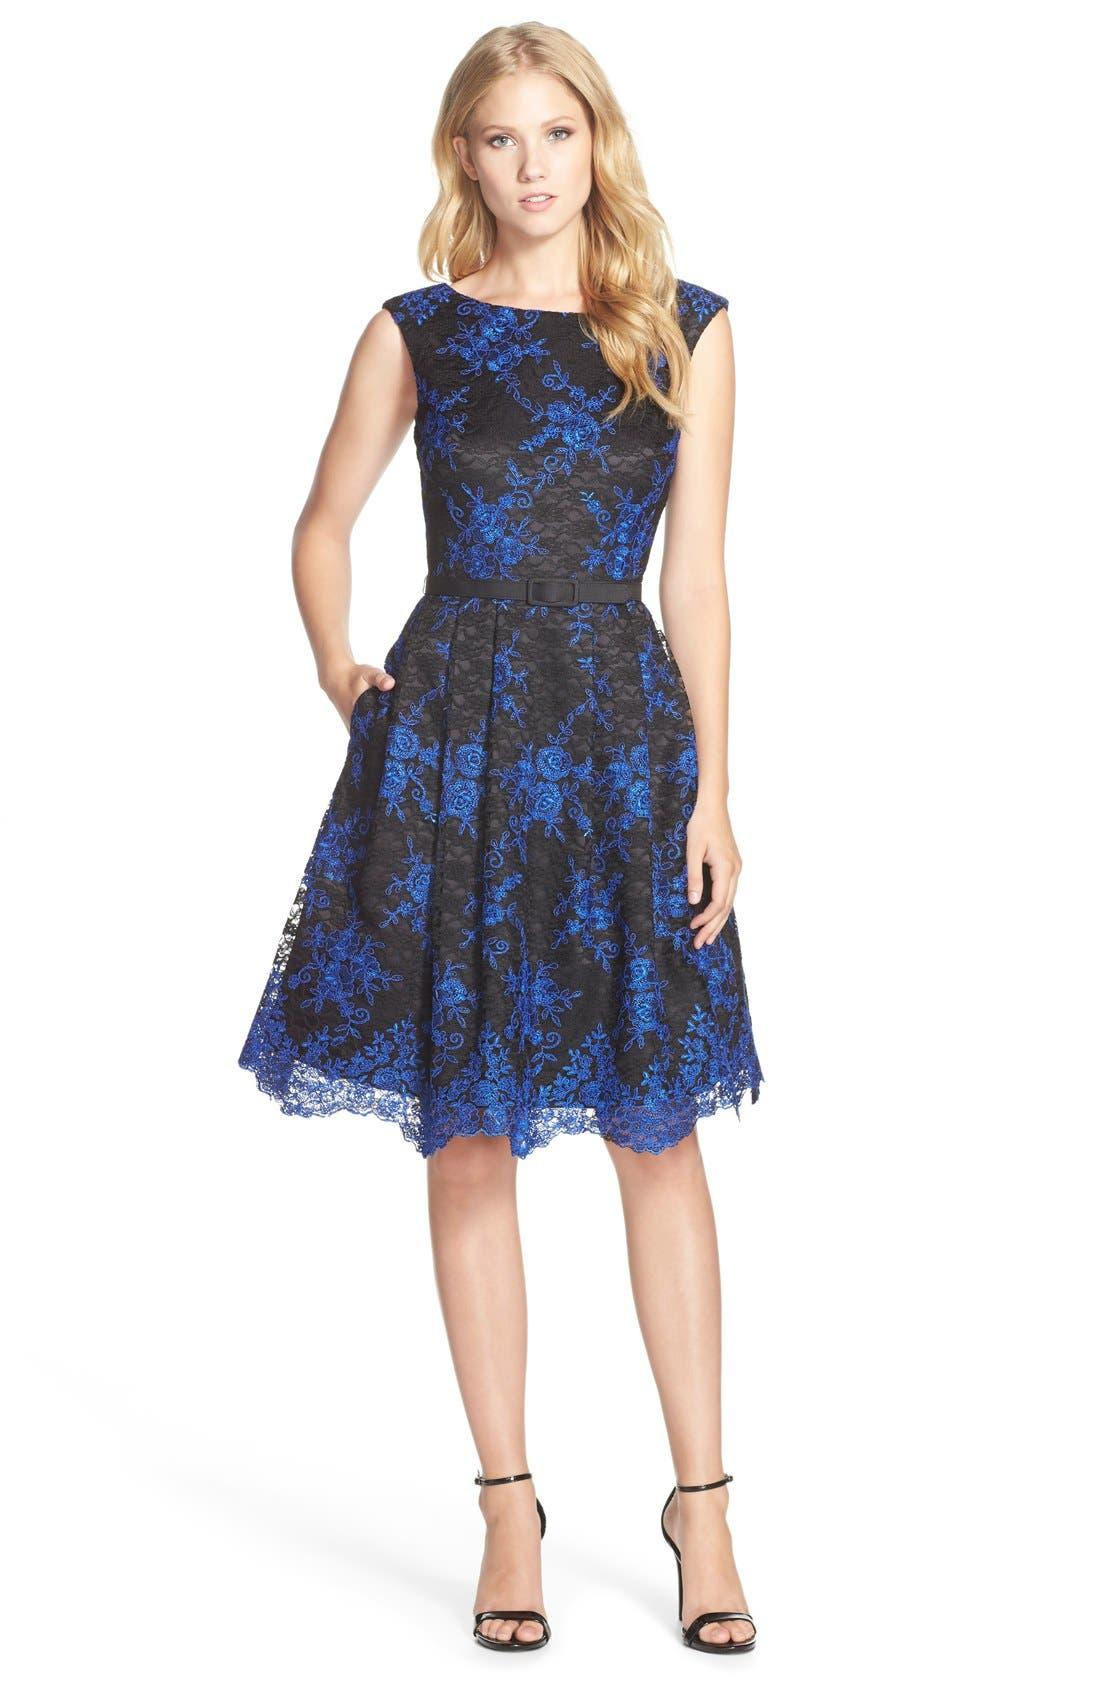 Alternate Image 1 Selected - Eliza J Belted Embroidered Lace Fit & Flare Dress (Regular & Petite)